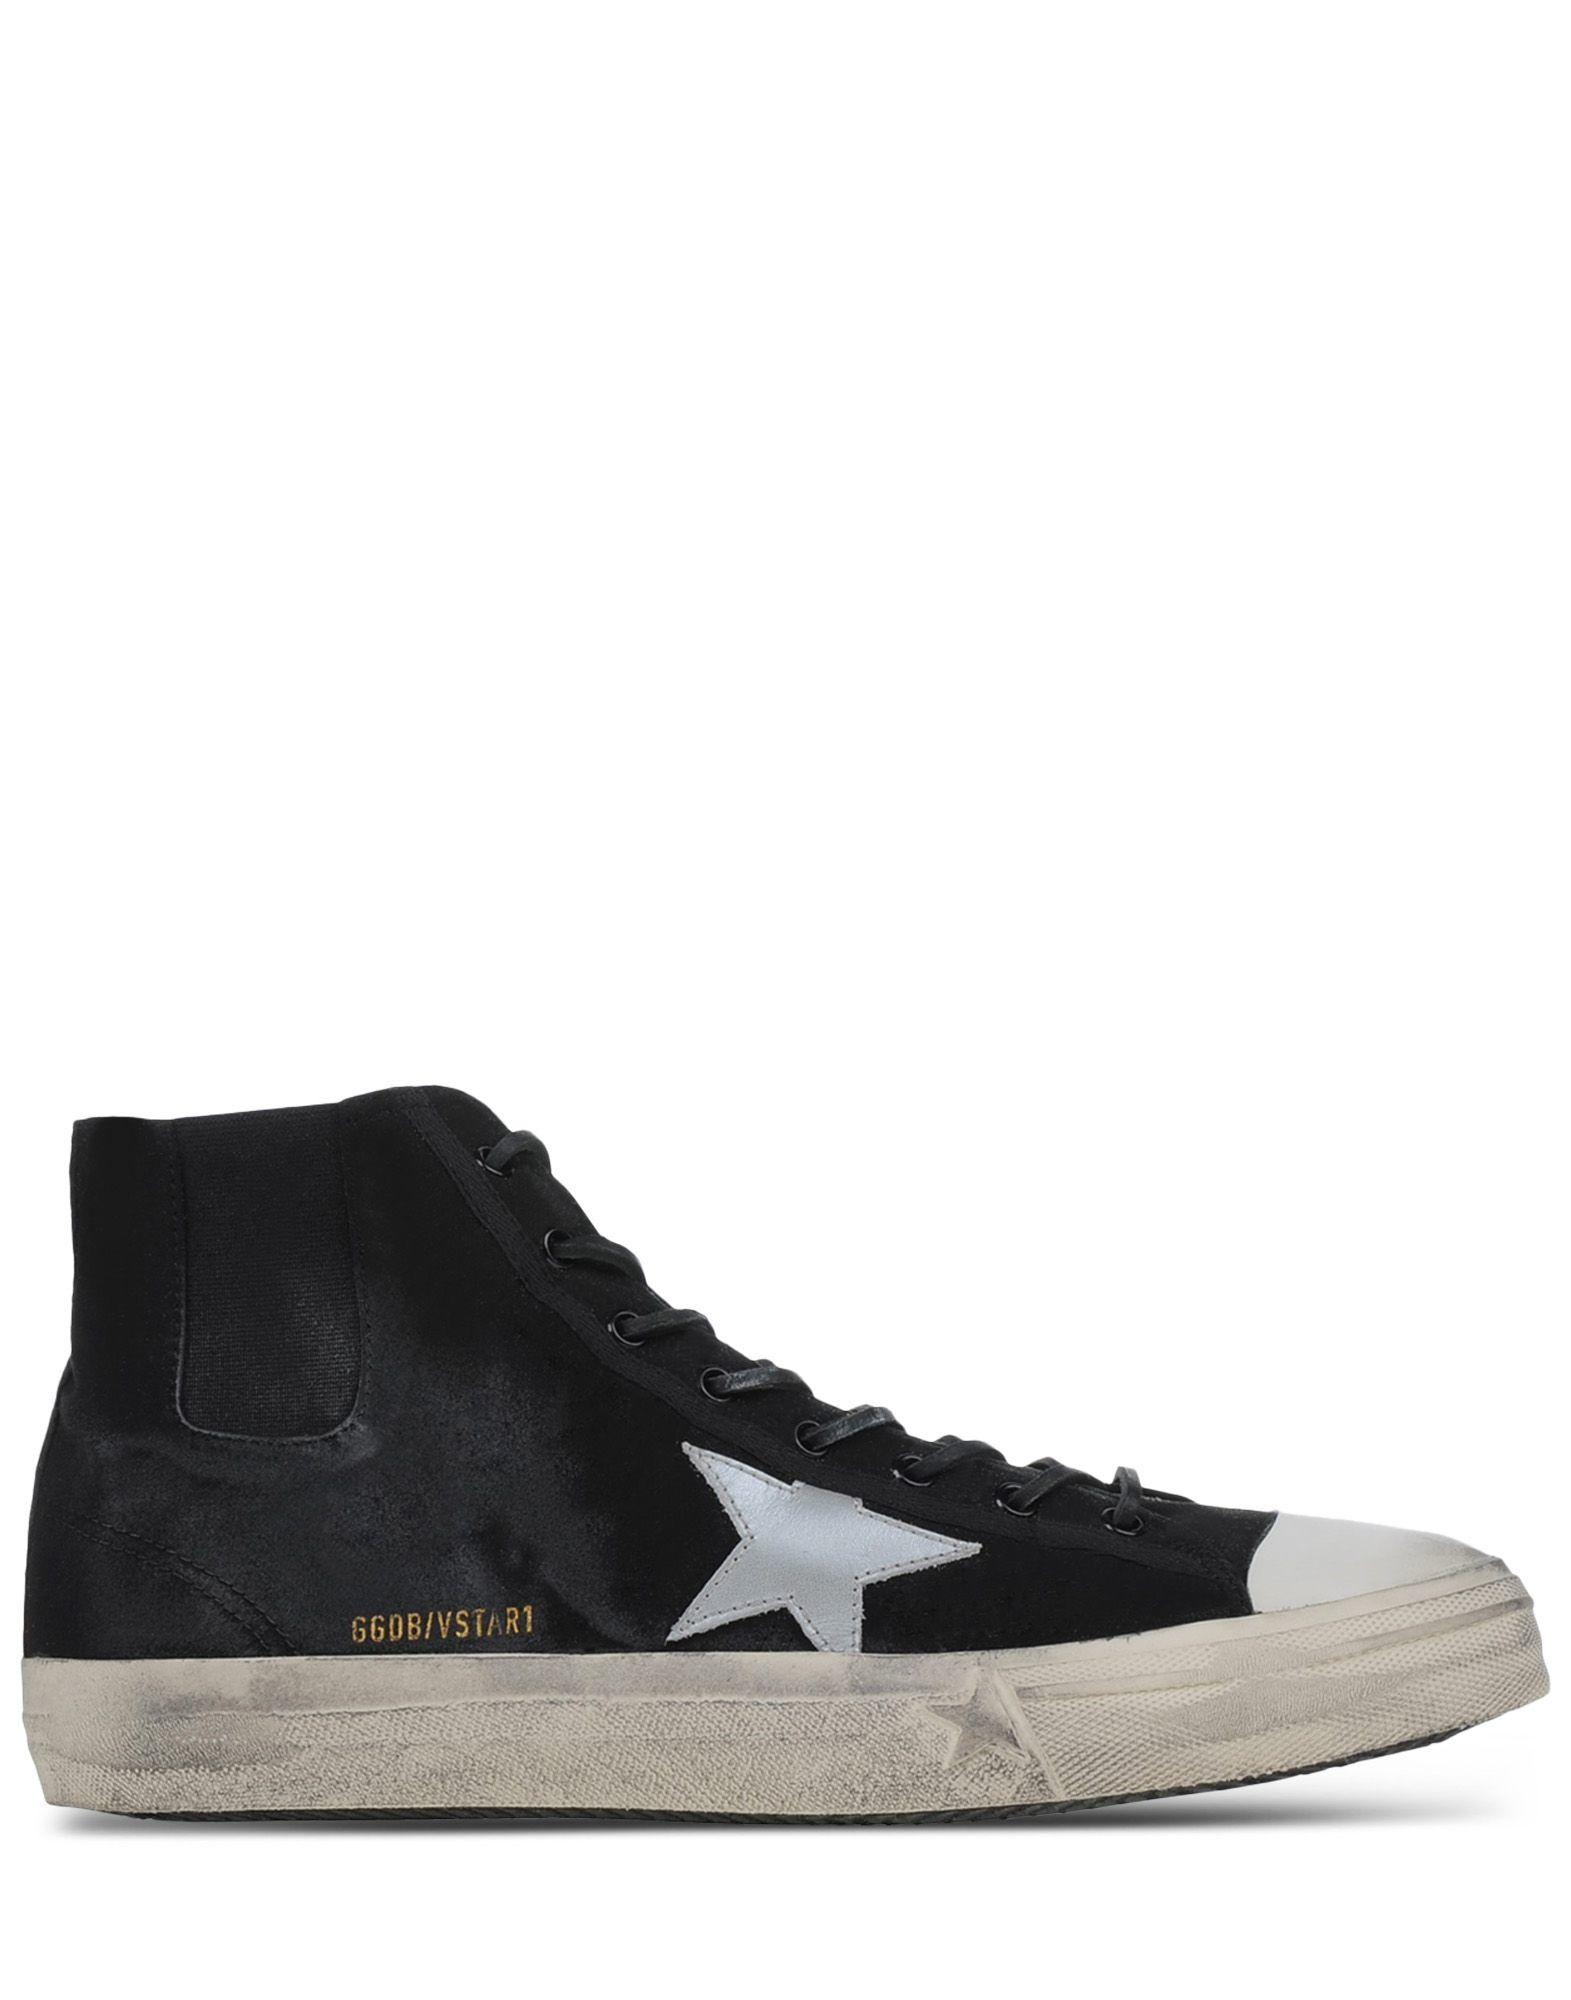 golden goose deluxe brand high top sneakers in black for men lyst. Black Bedroom Furniture Sets. Home Design Ideas